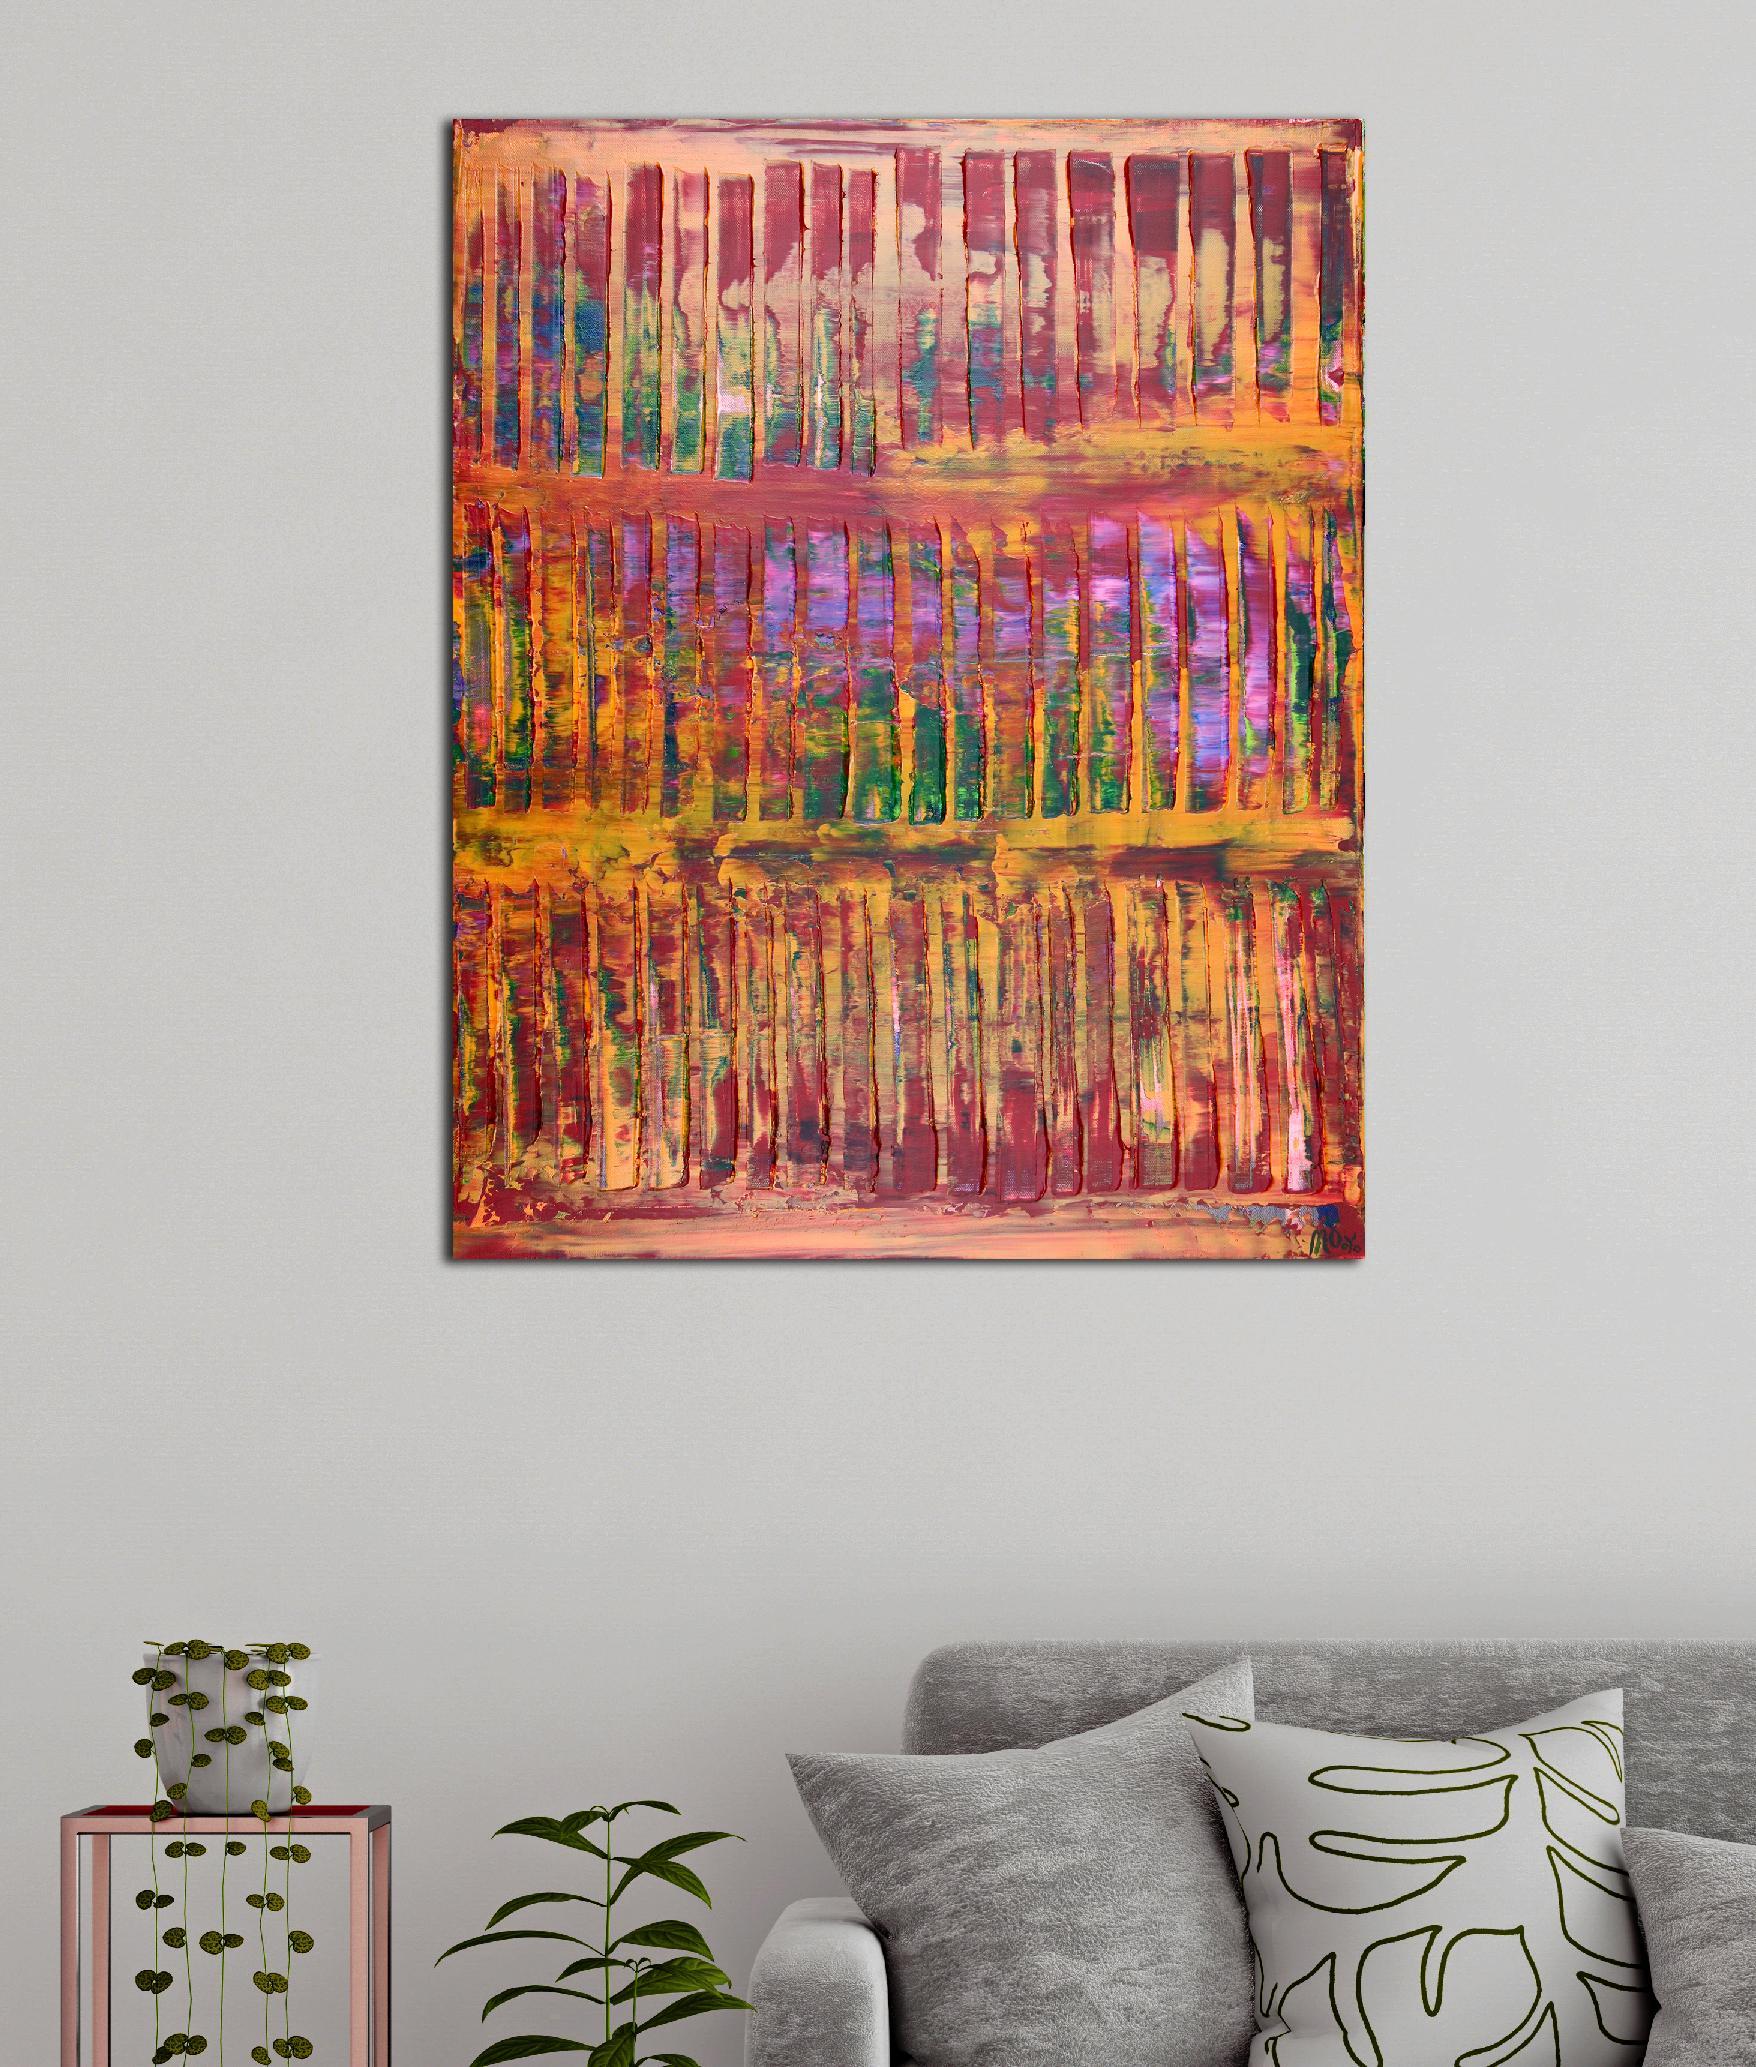 Sunset intrusions (Orange Sky) 2 (2020) Abstract Acrylic painting by Nestor Toro